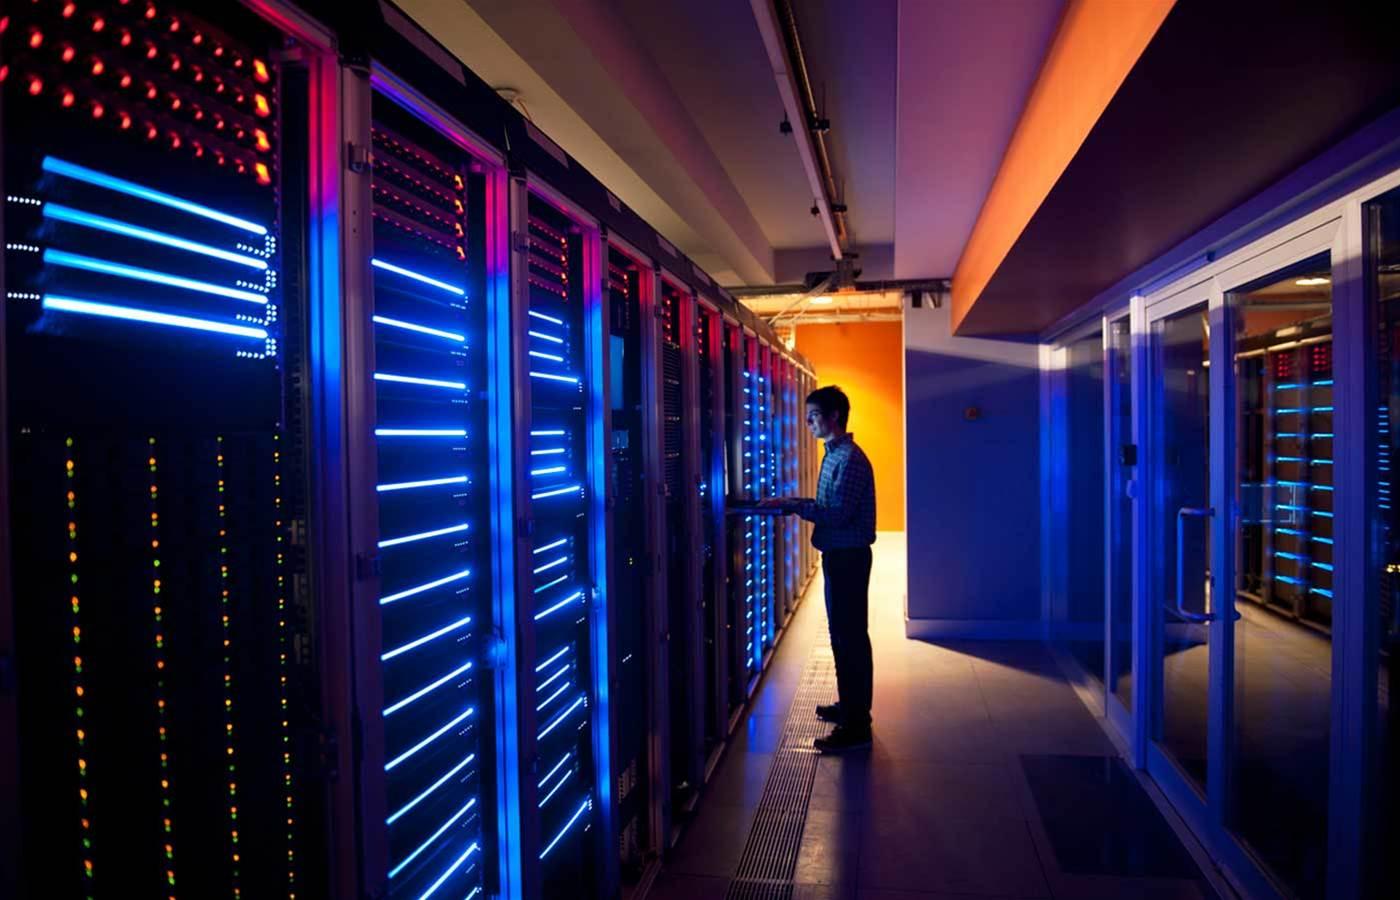 Australia's hyperscale cloud market nears $400 million